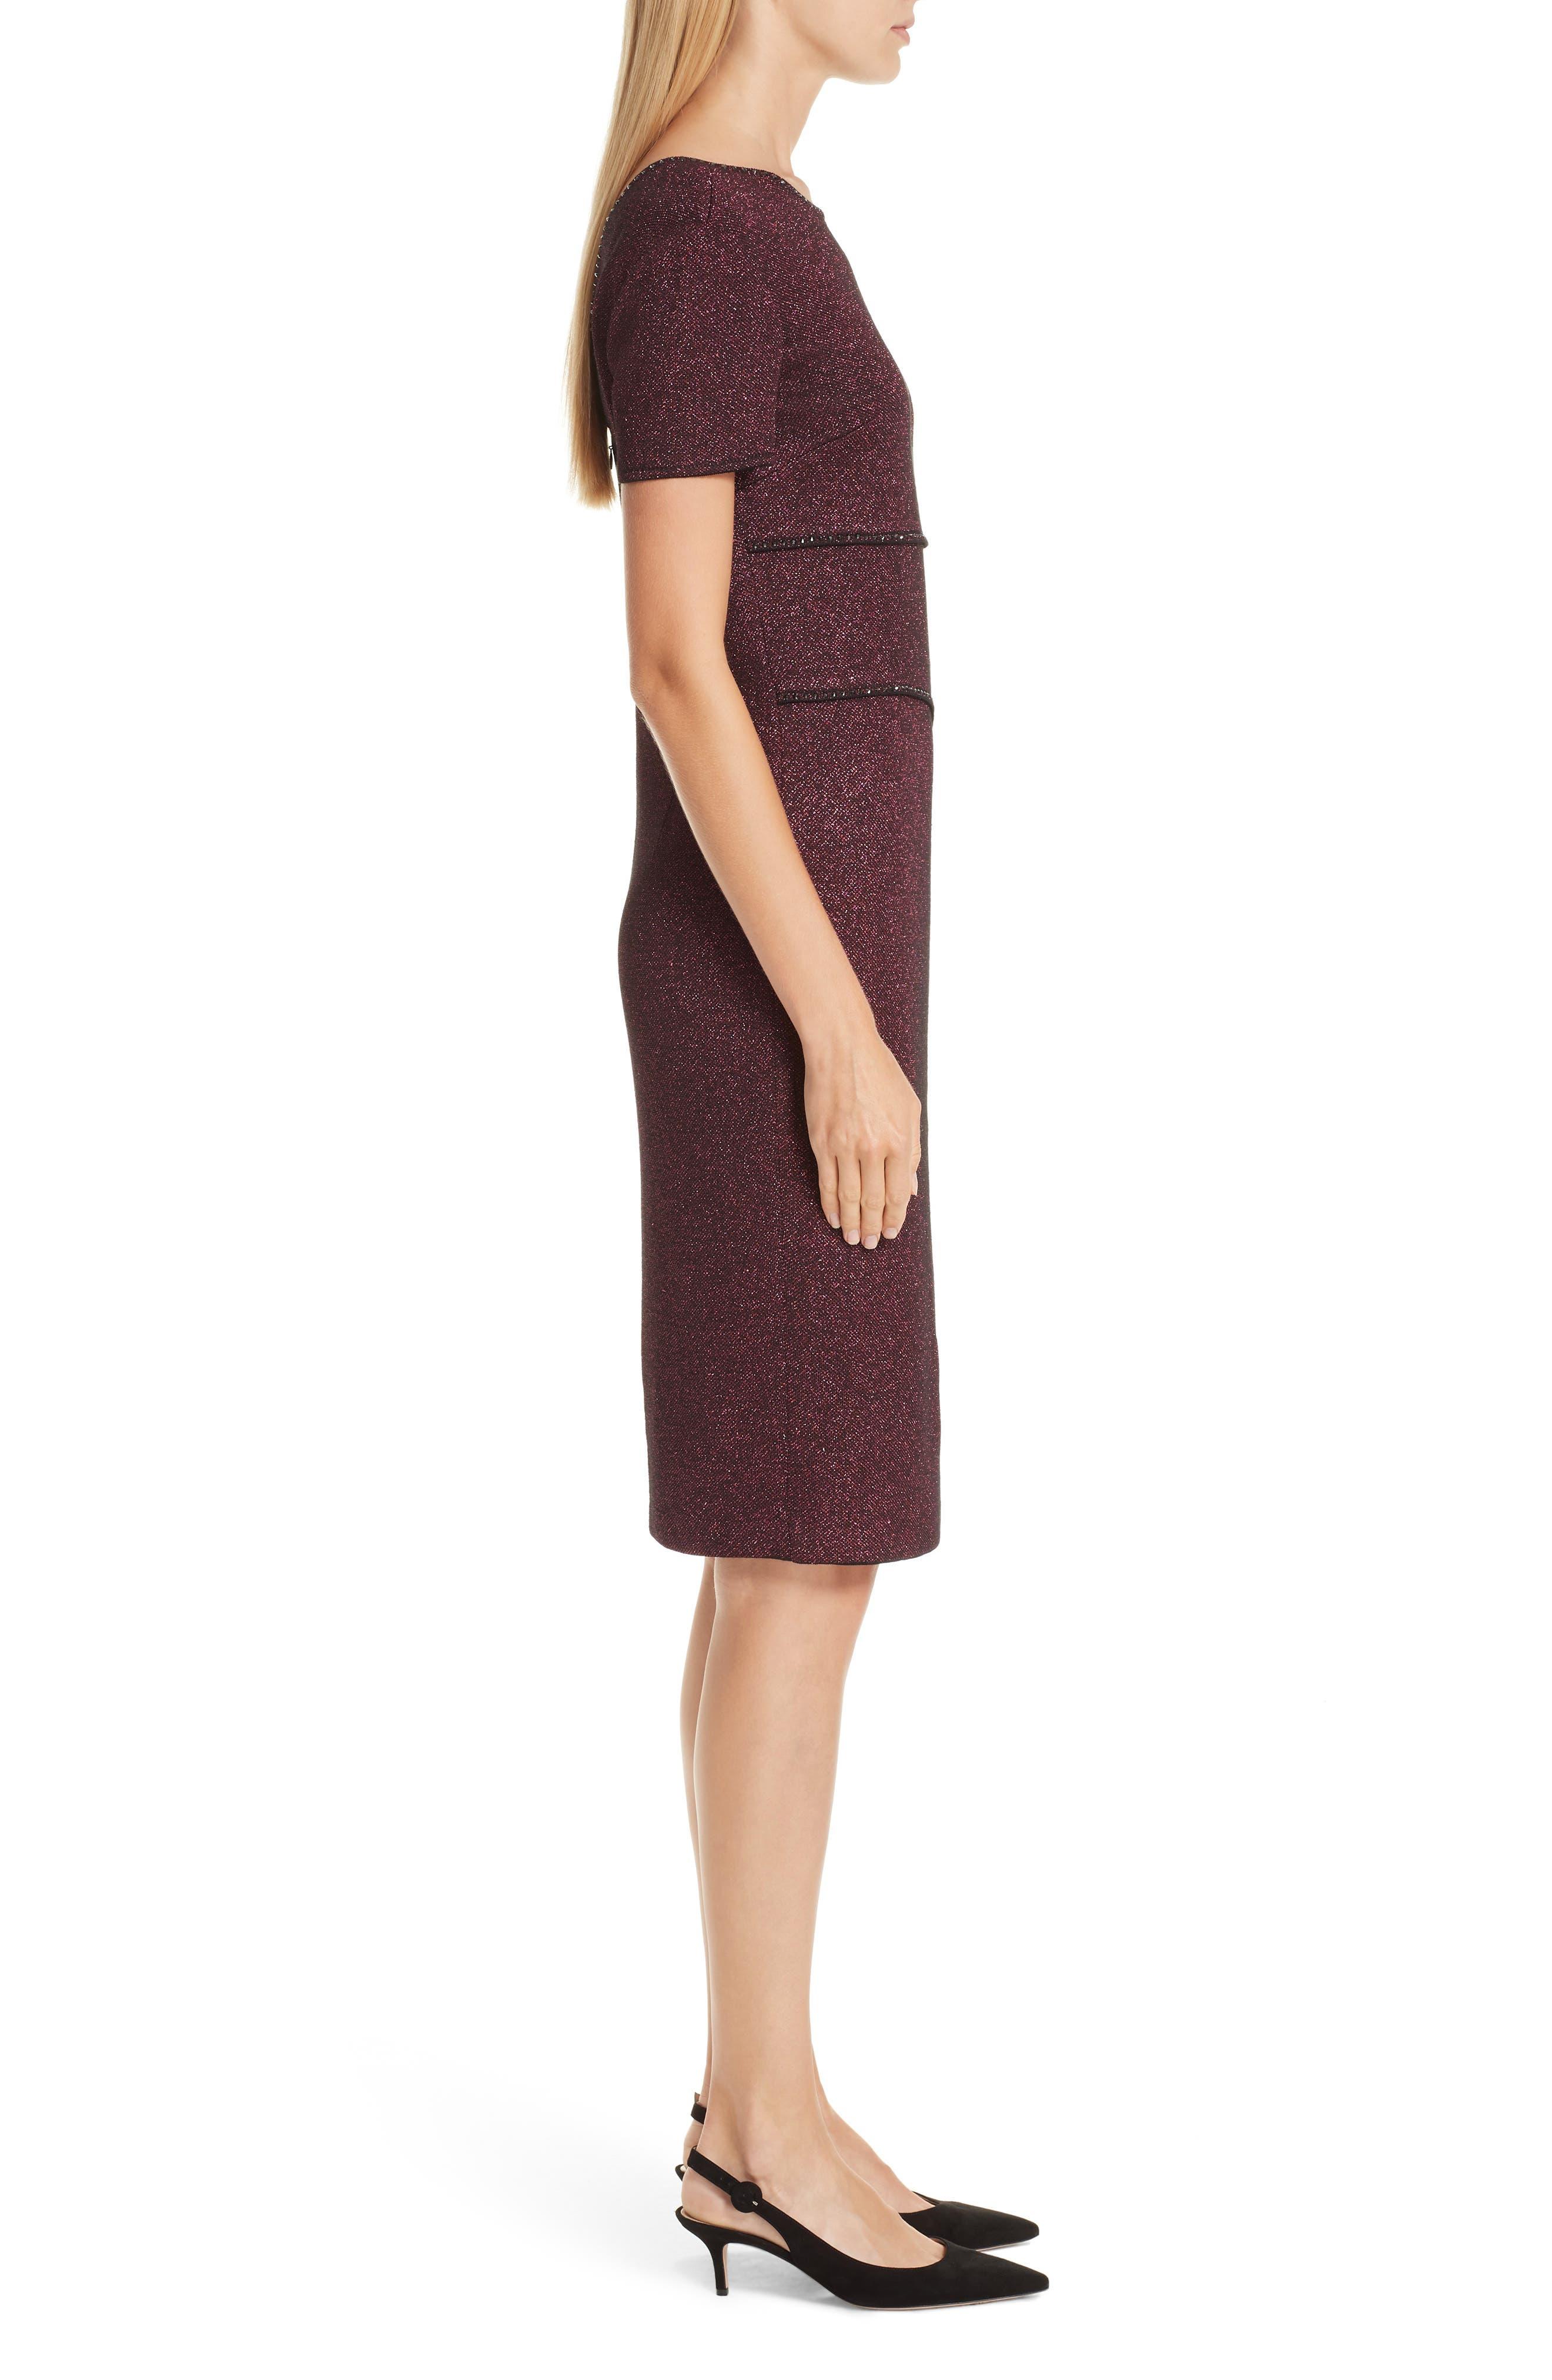 ST. JOHN COLLECTION, Mod Metallic Knit Sheath Dress, Alternate thumbnail 4, color, DARK PINK MULTI